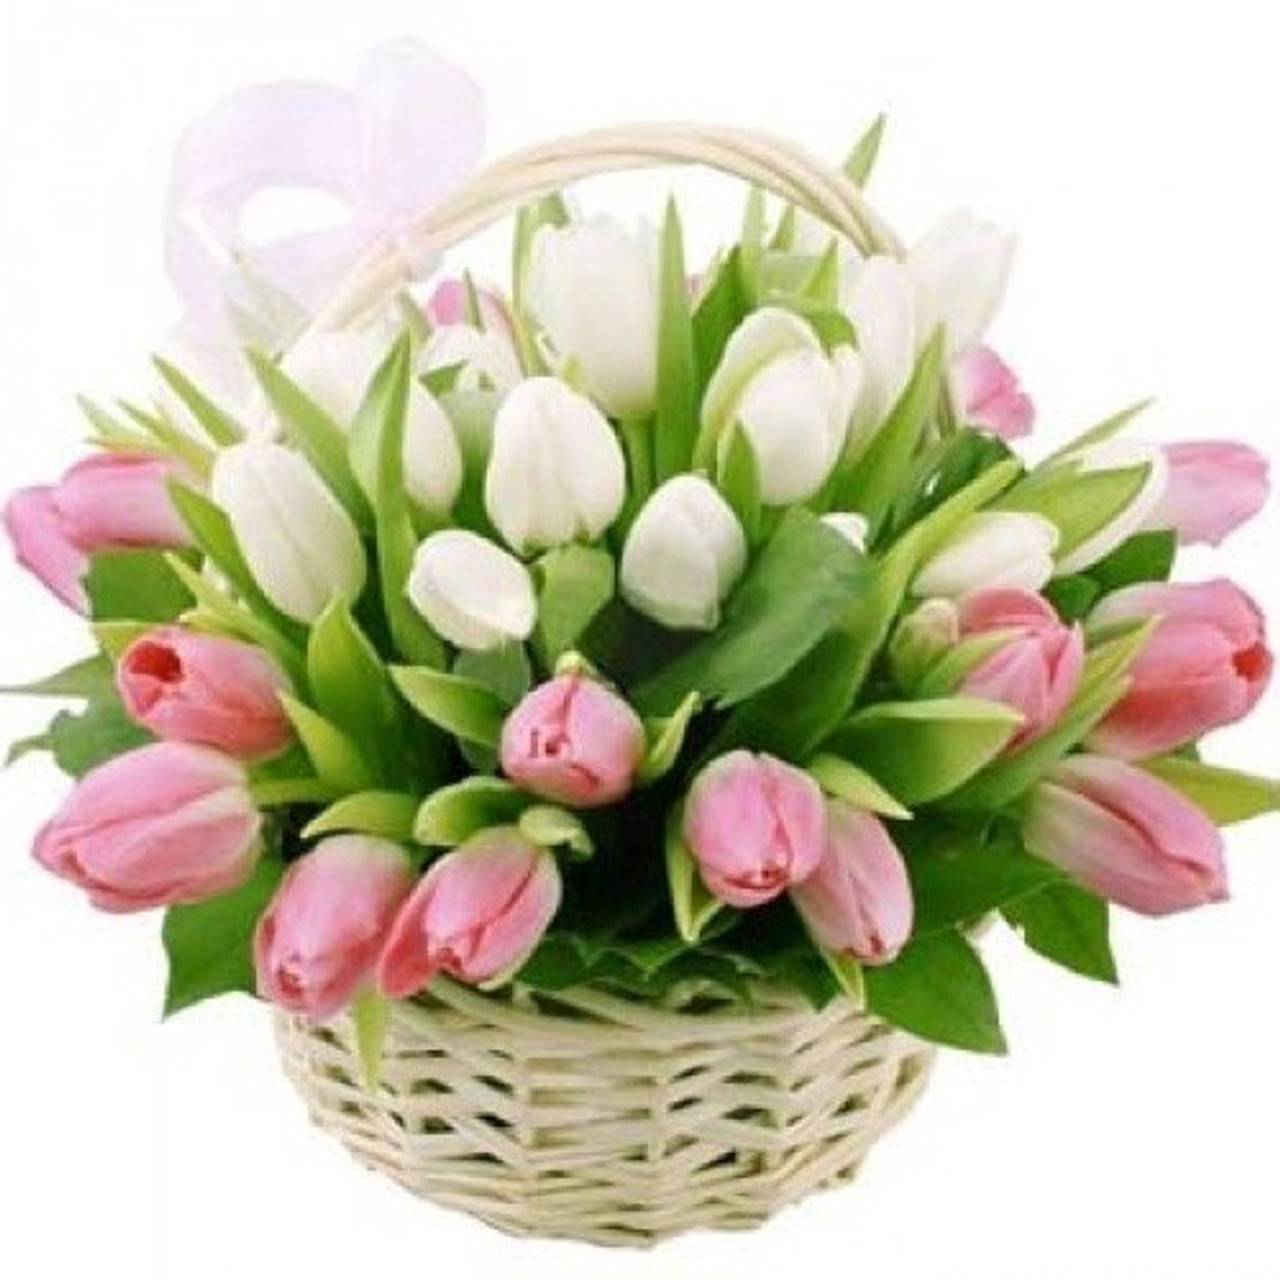 20 White & Pink Holland Tulips Basket